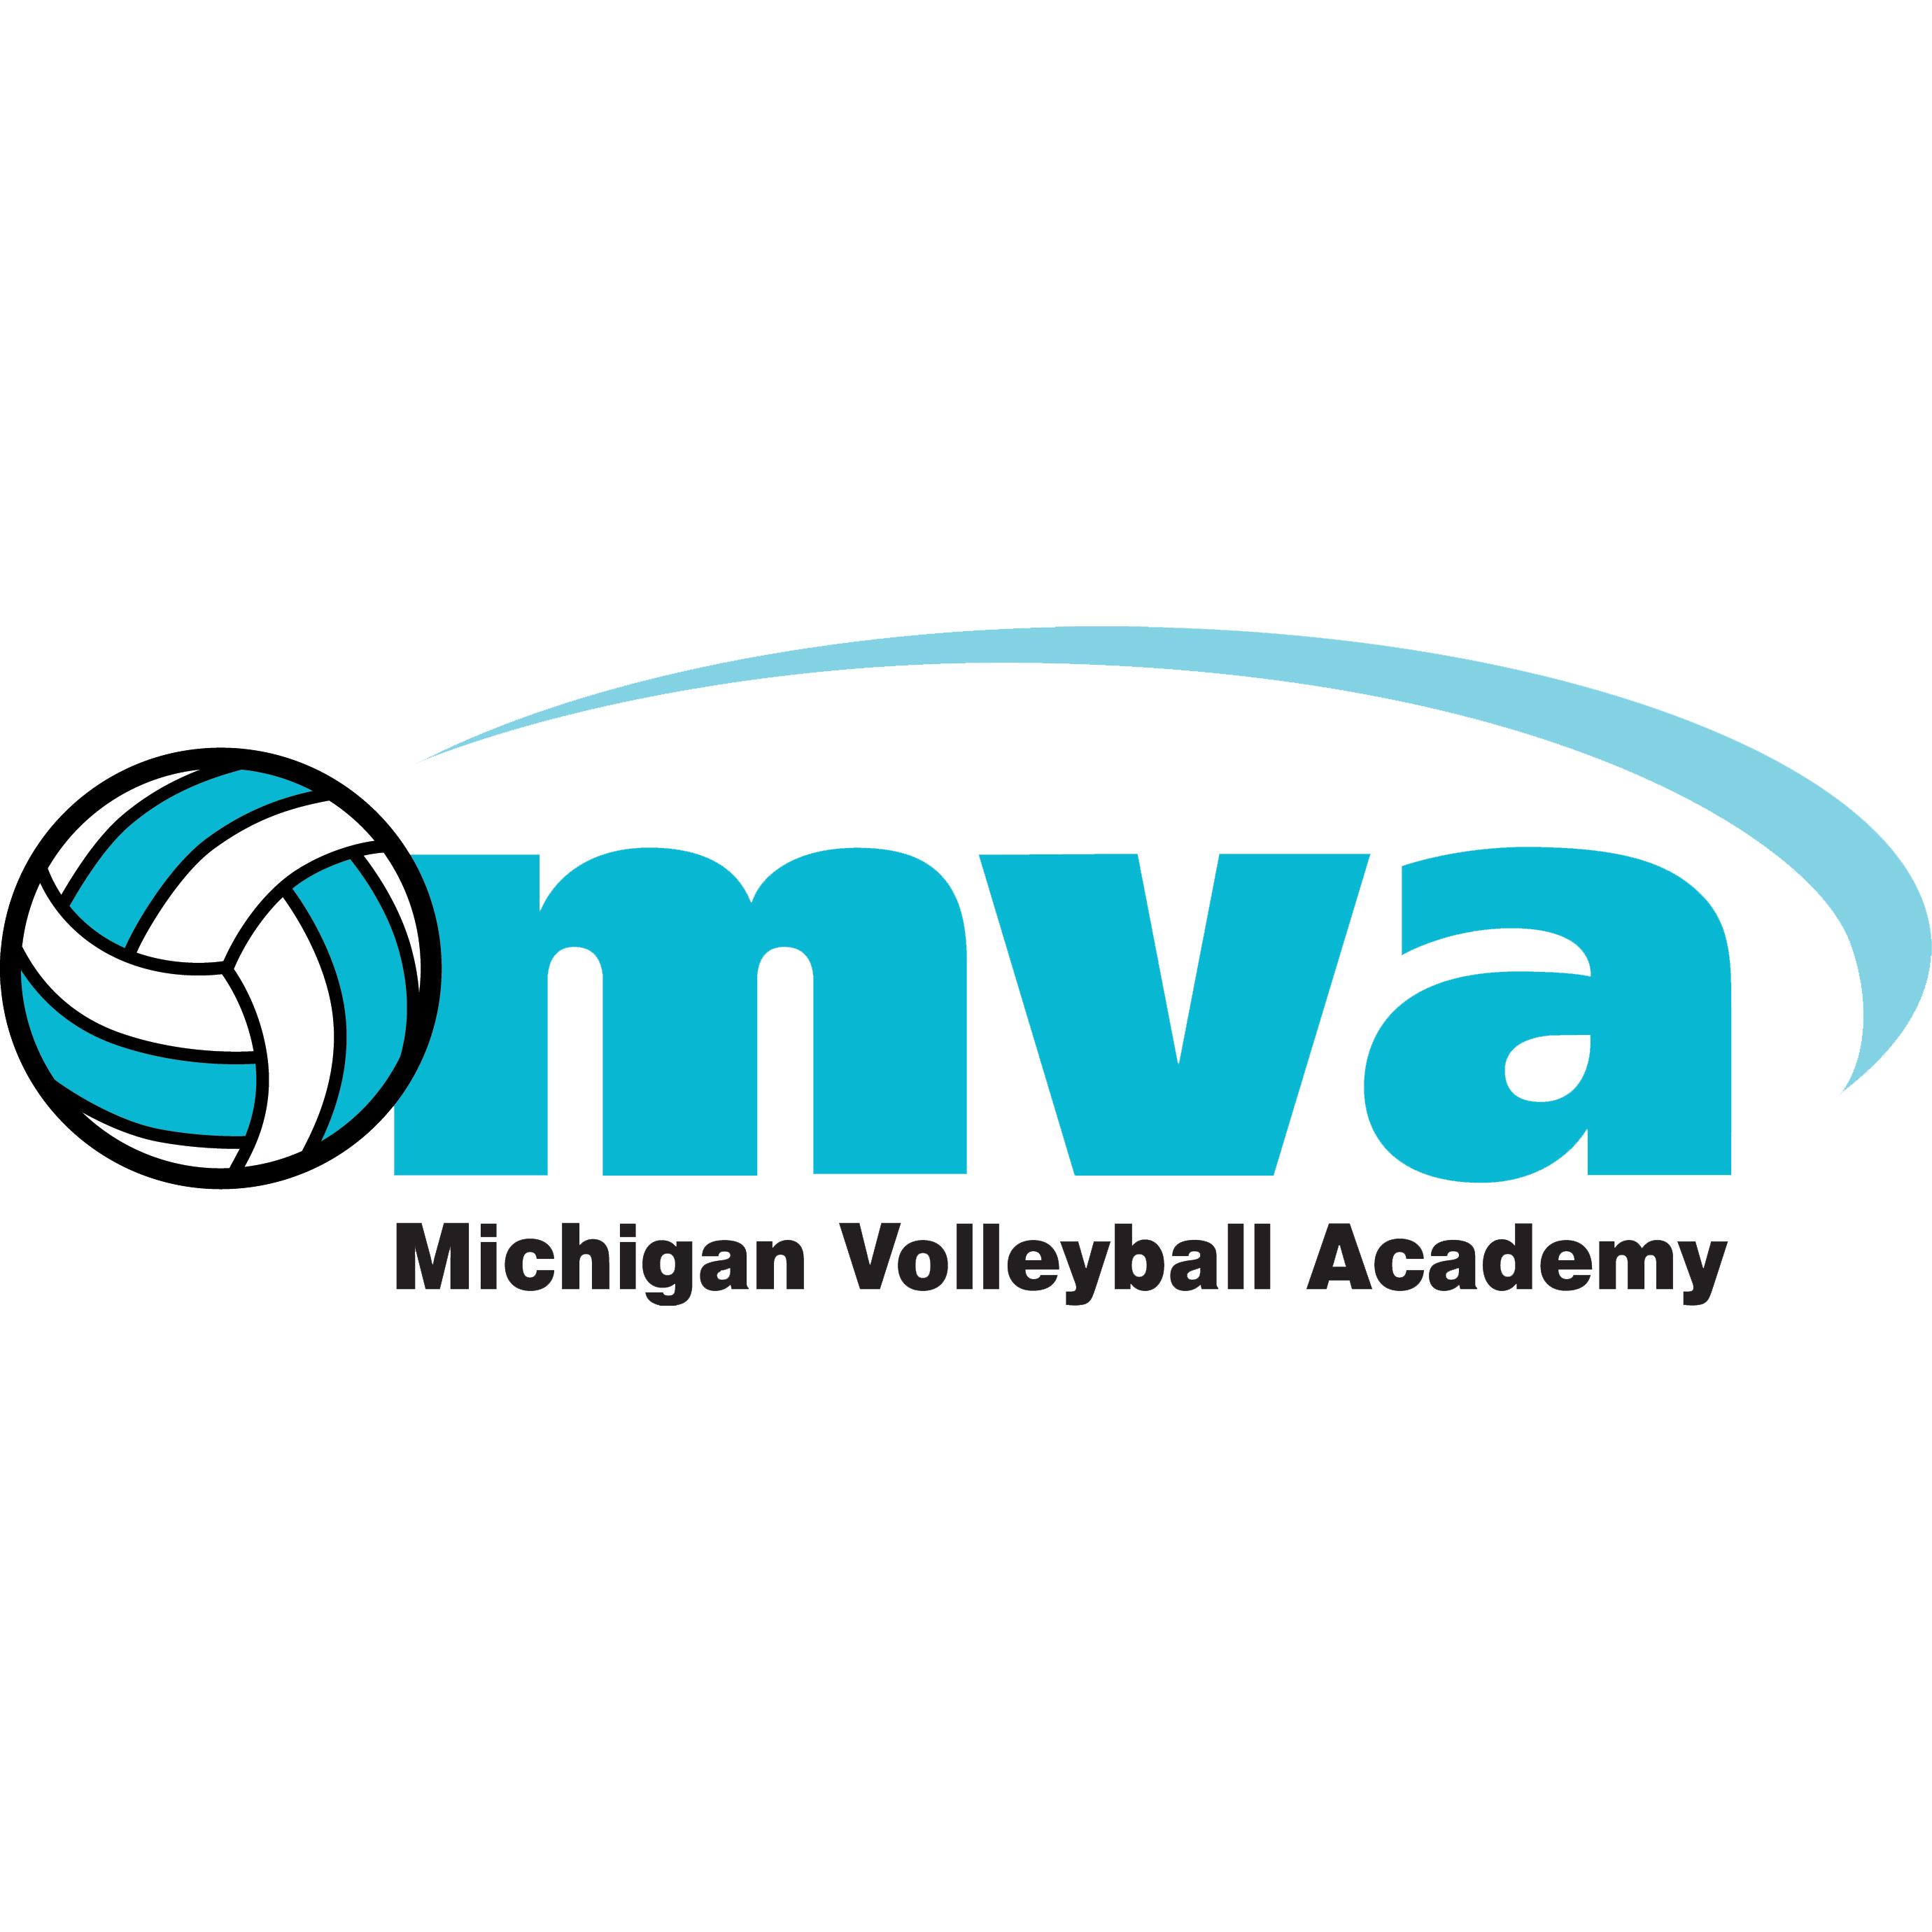 Michigan Volleyball Academy